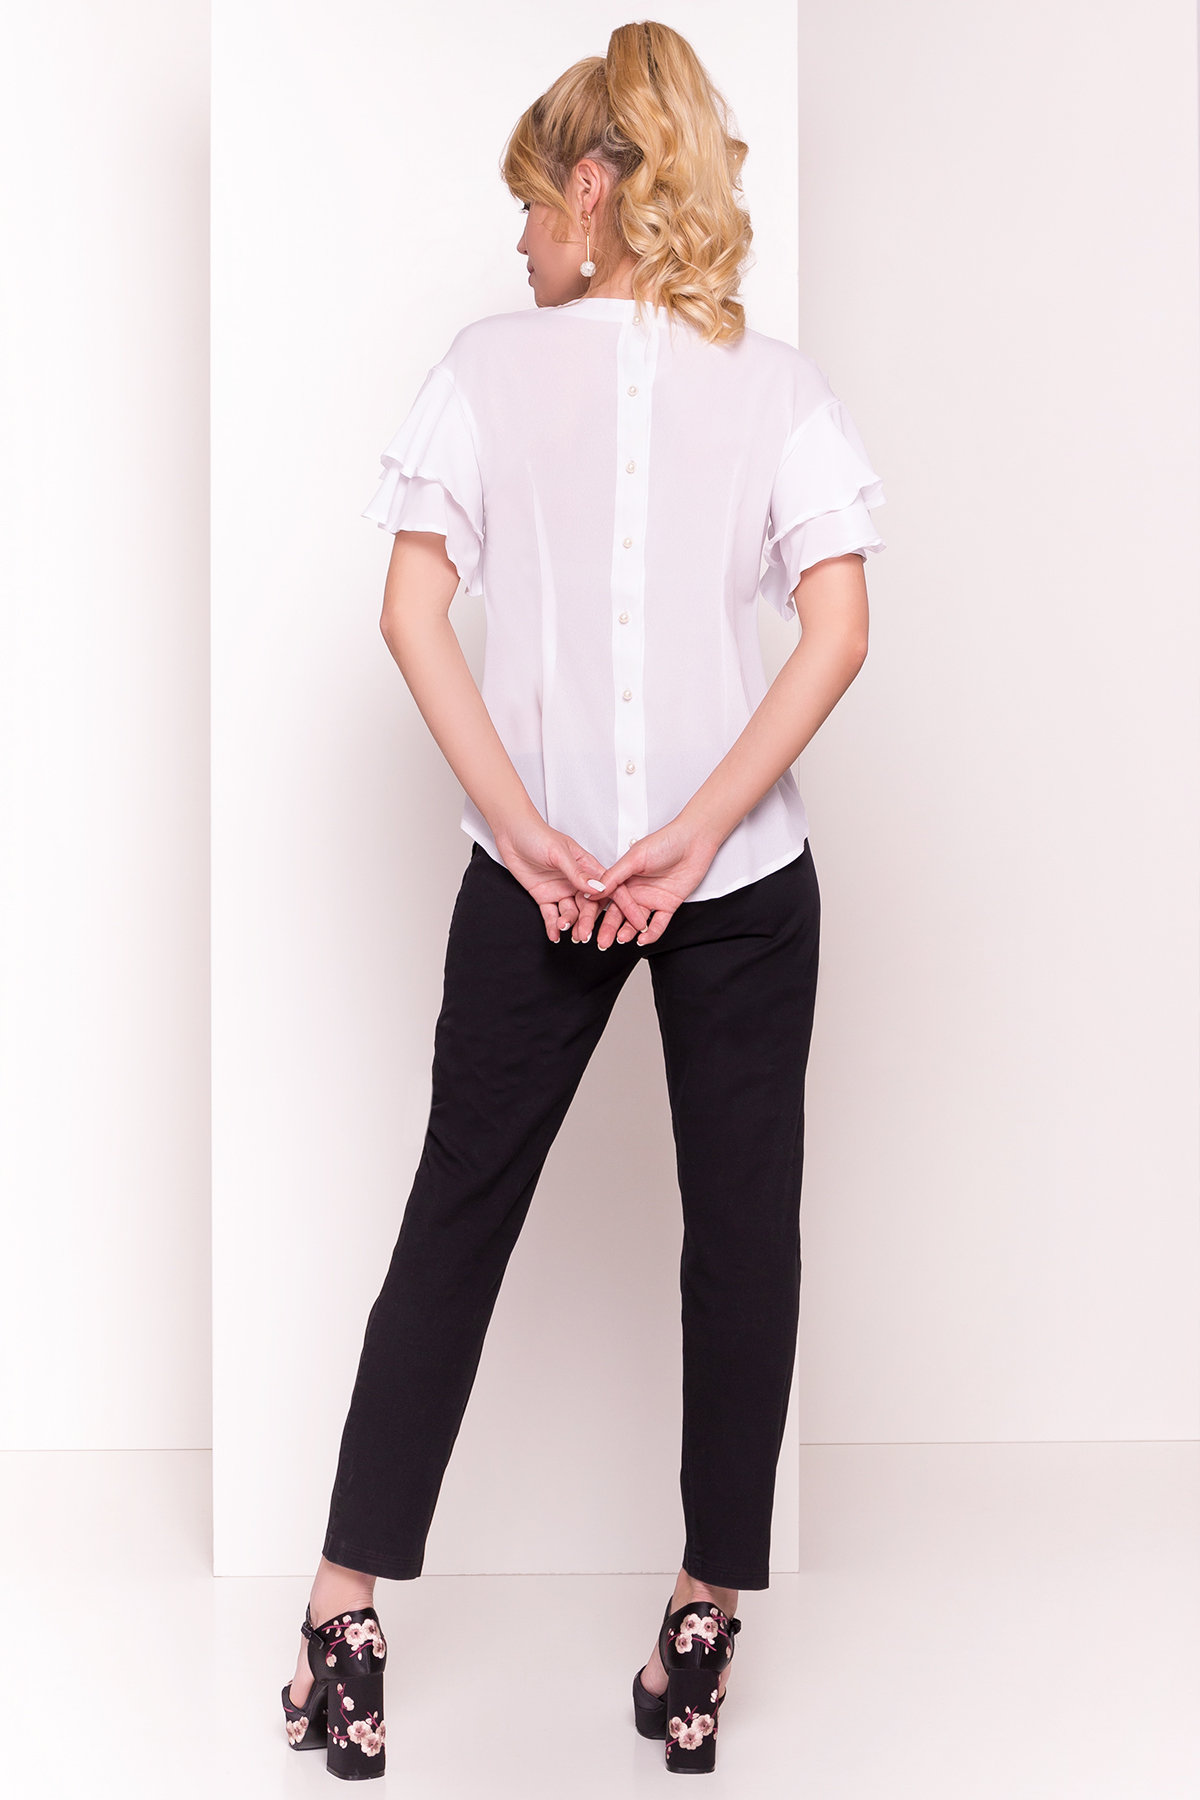 Блуза Мария 4882 АРТ. 35800 Цвет: Белый - фото 3, интернет магазин tm-modus.ru